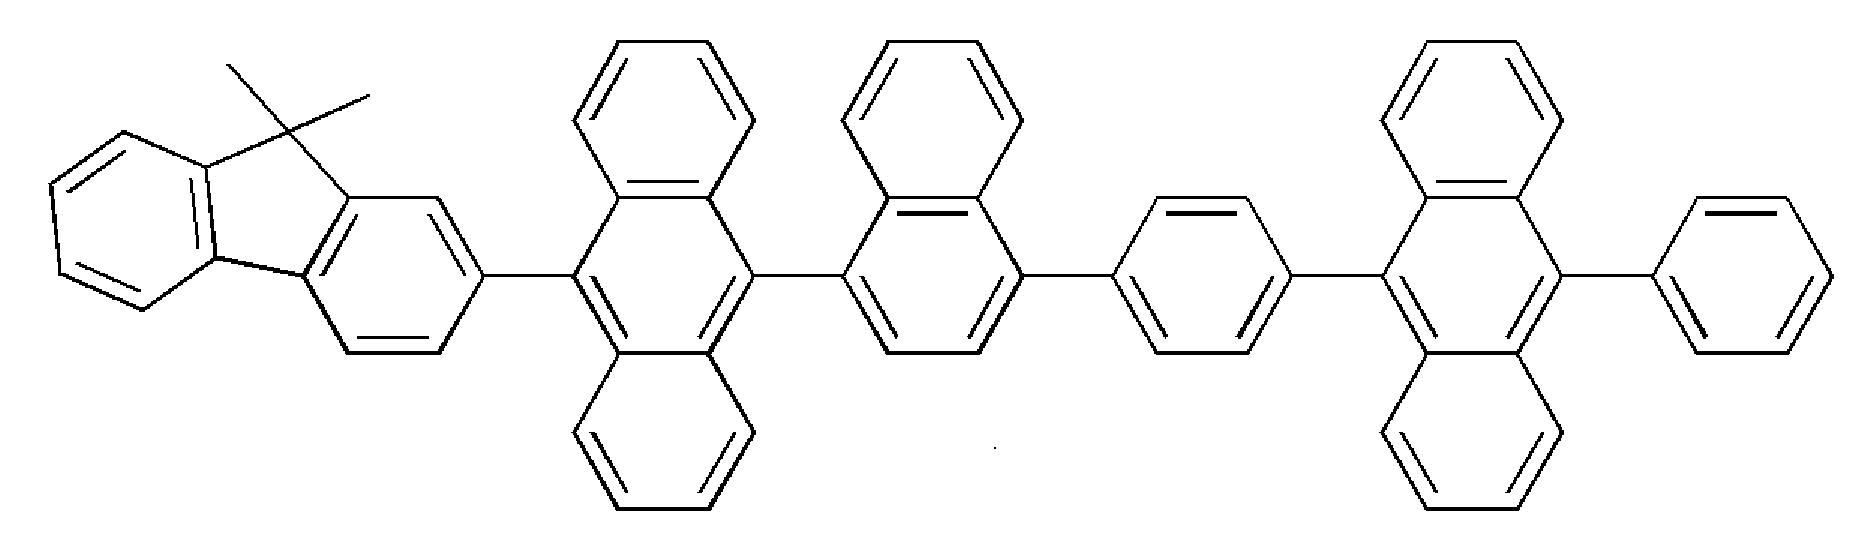 Figure 112007083008831-pat00588